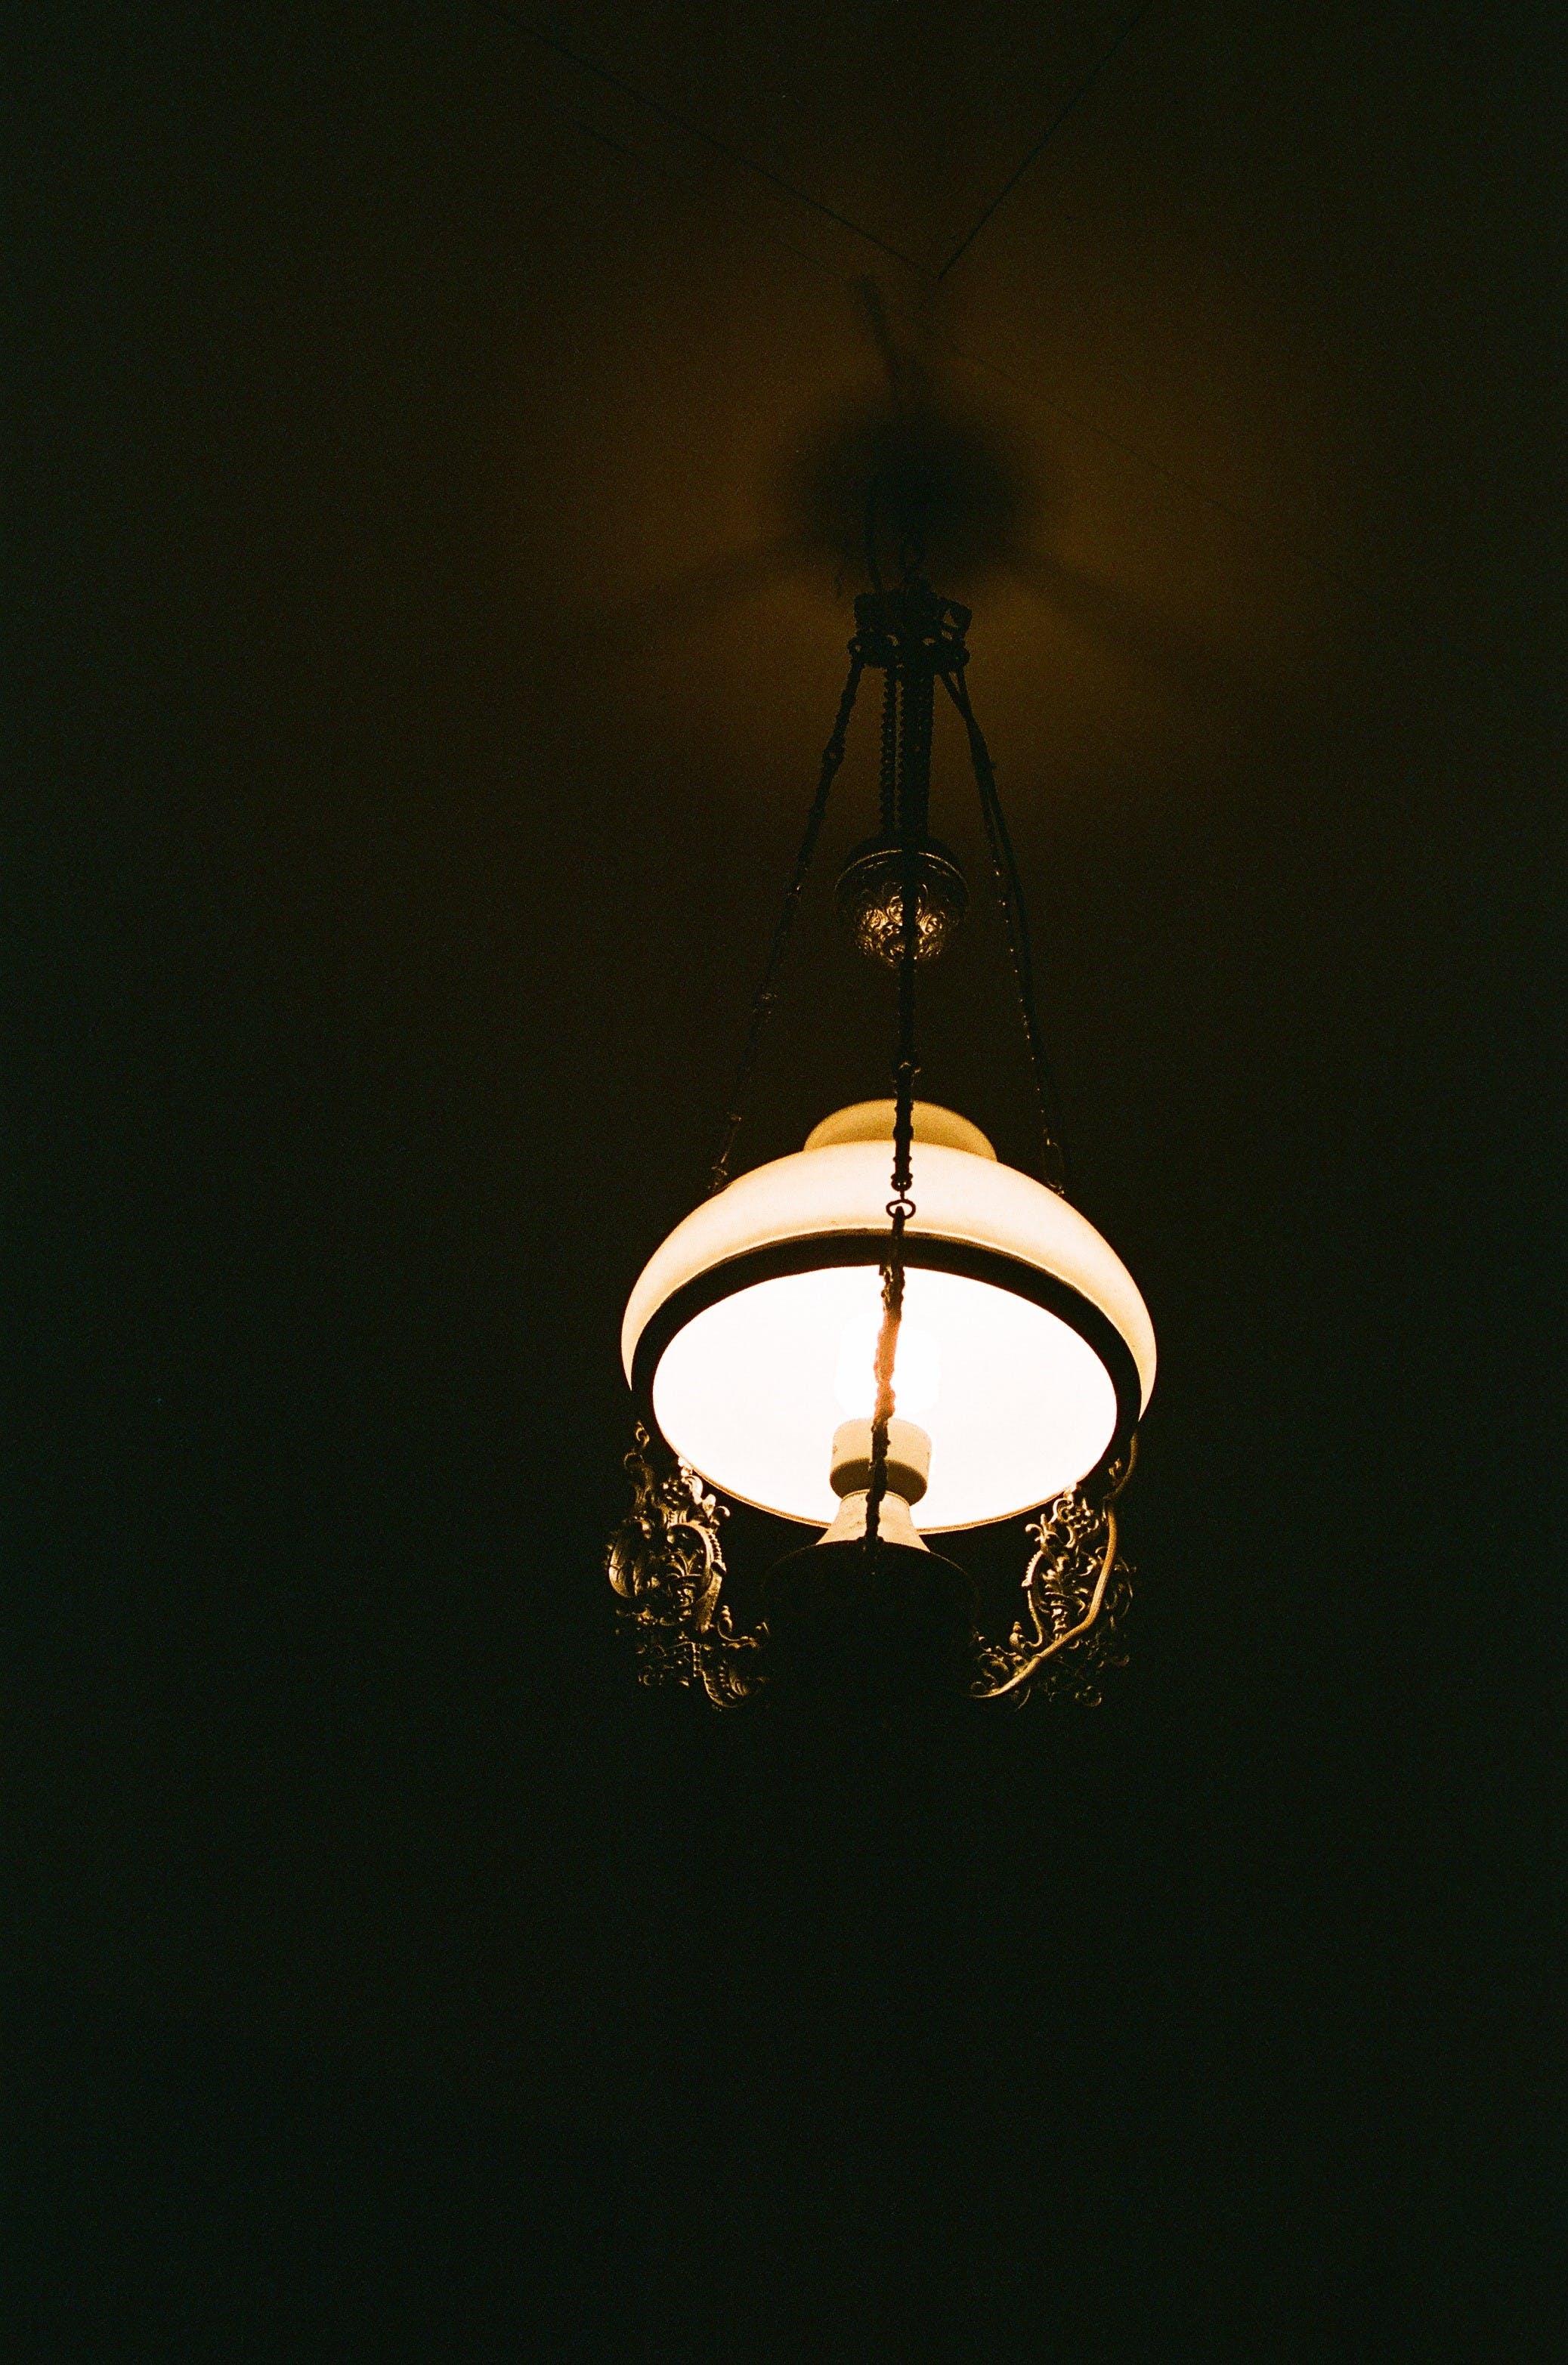 Free stock photo of analog camera, antique, antique lamp, dark